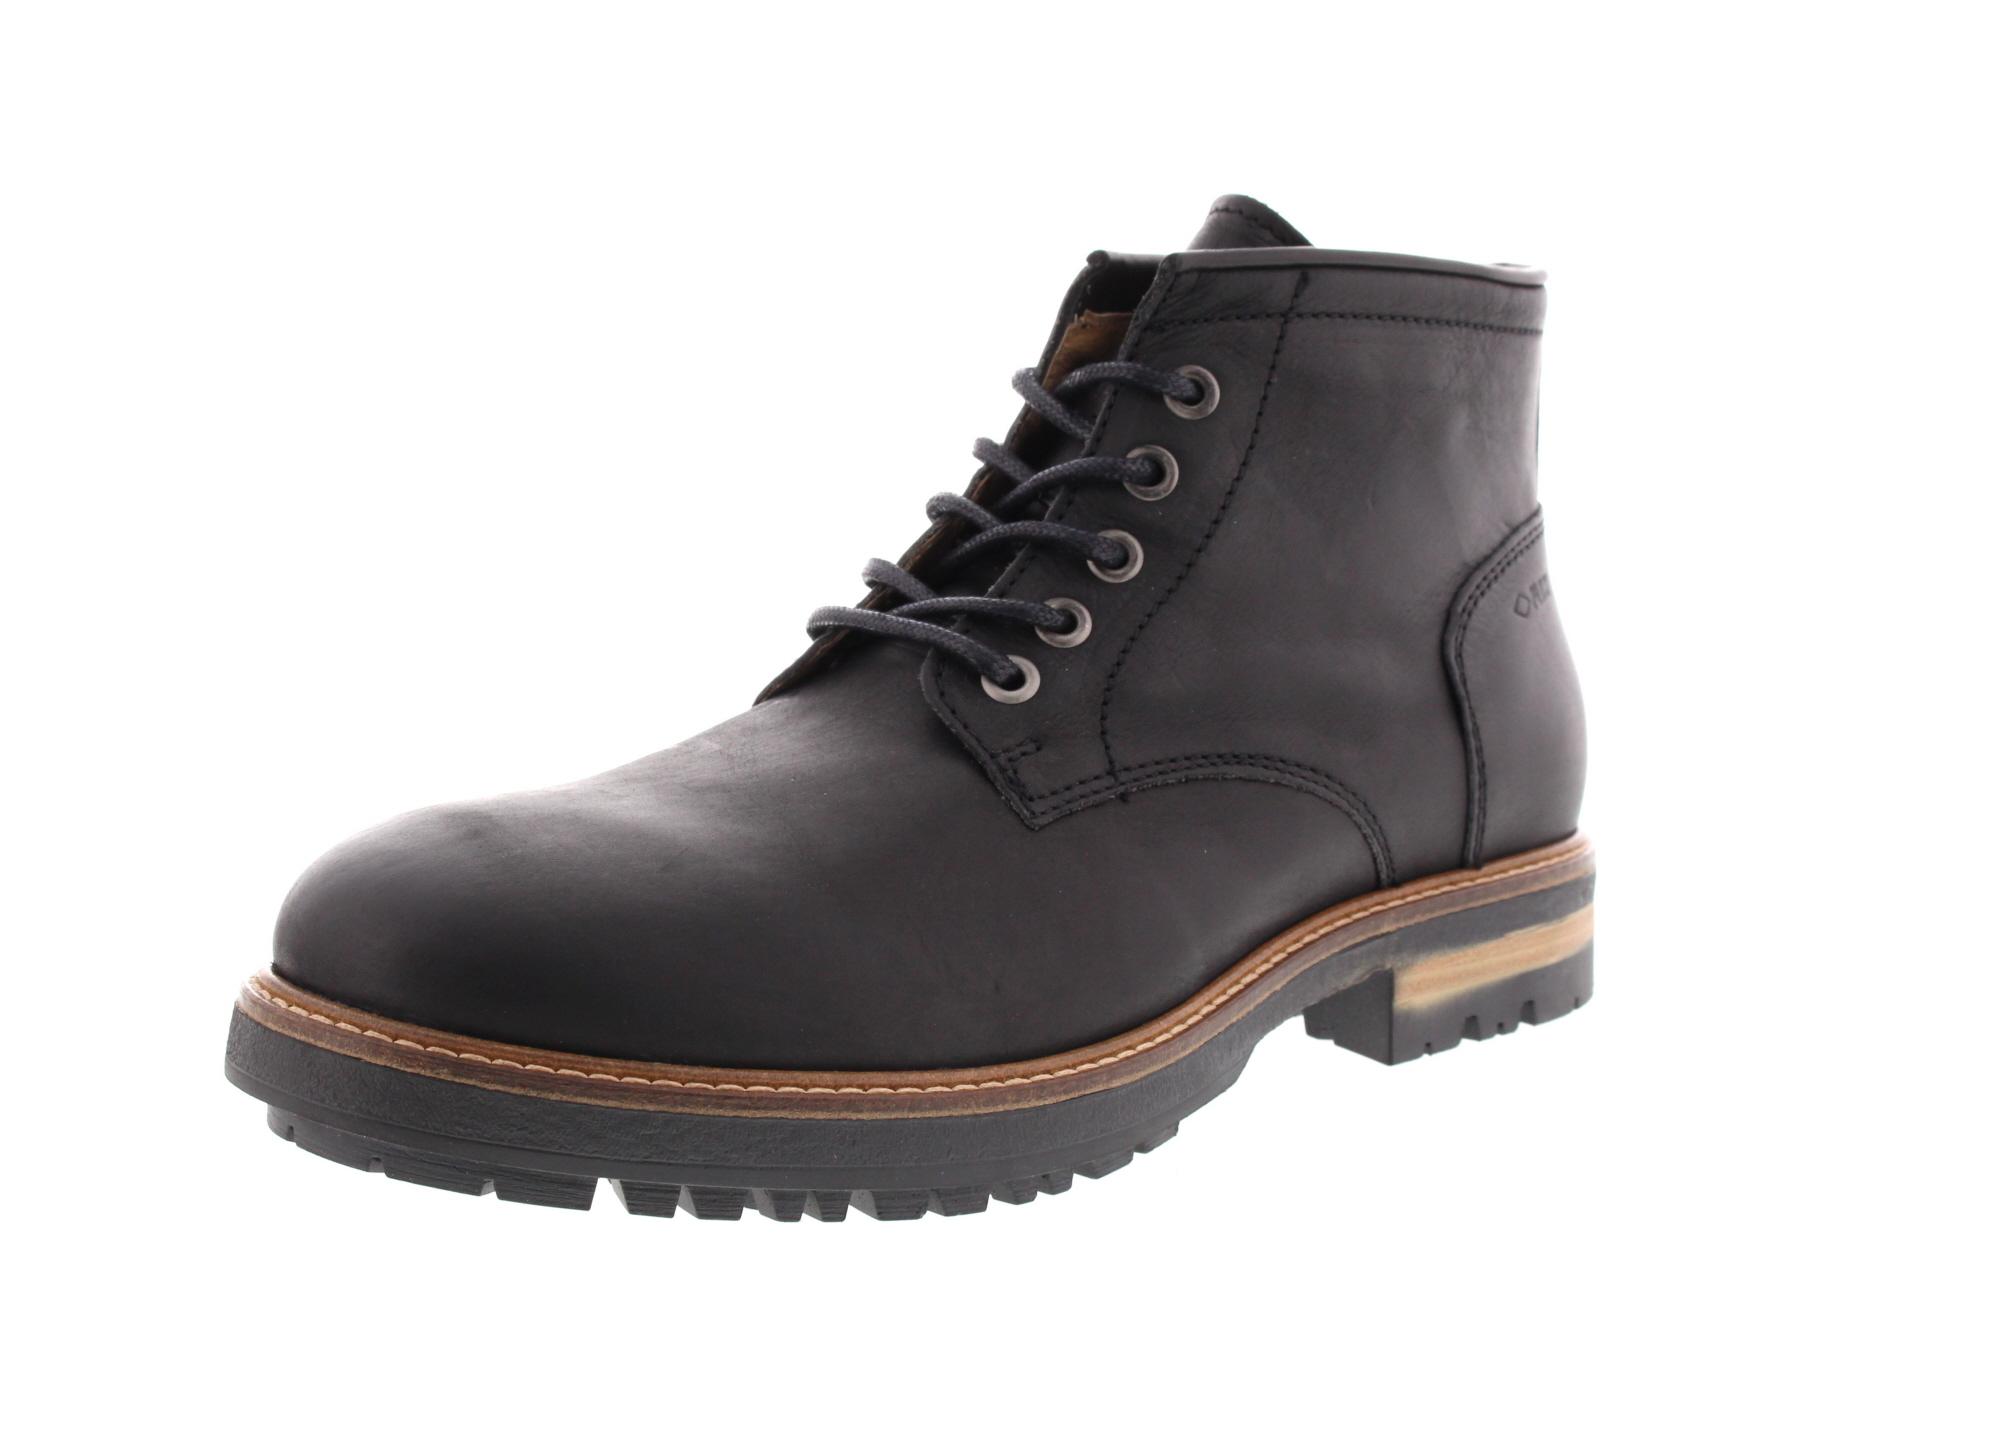 P-L-D-M by PALLADIUM Herren-Boots MOMBELLO CMR - black_0